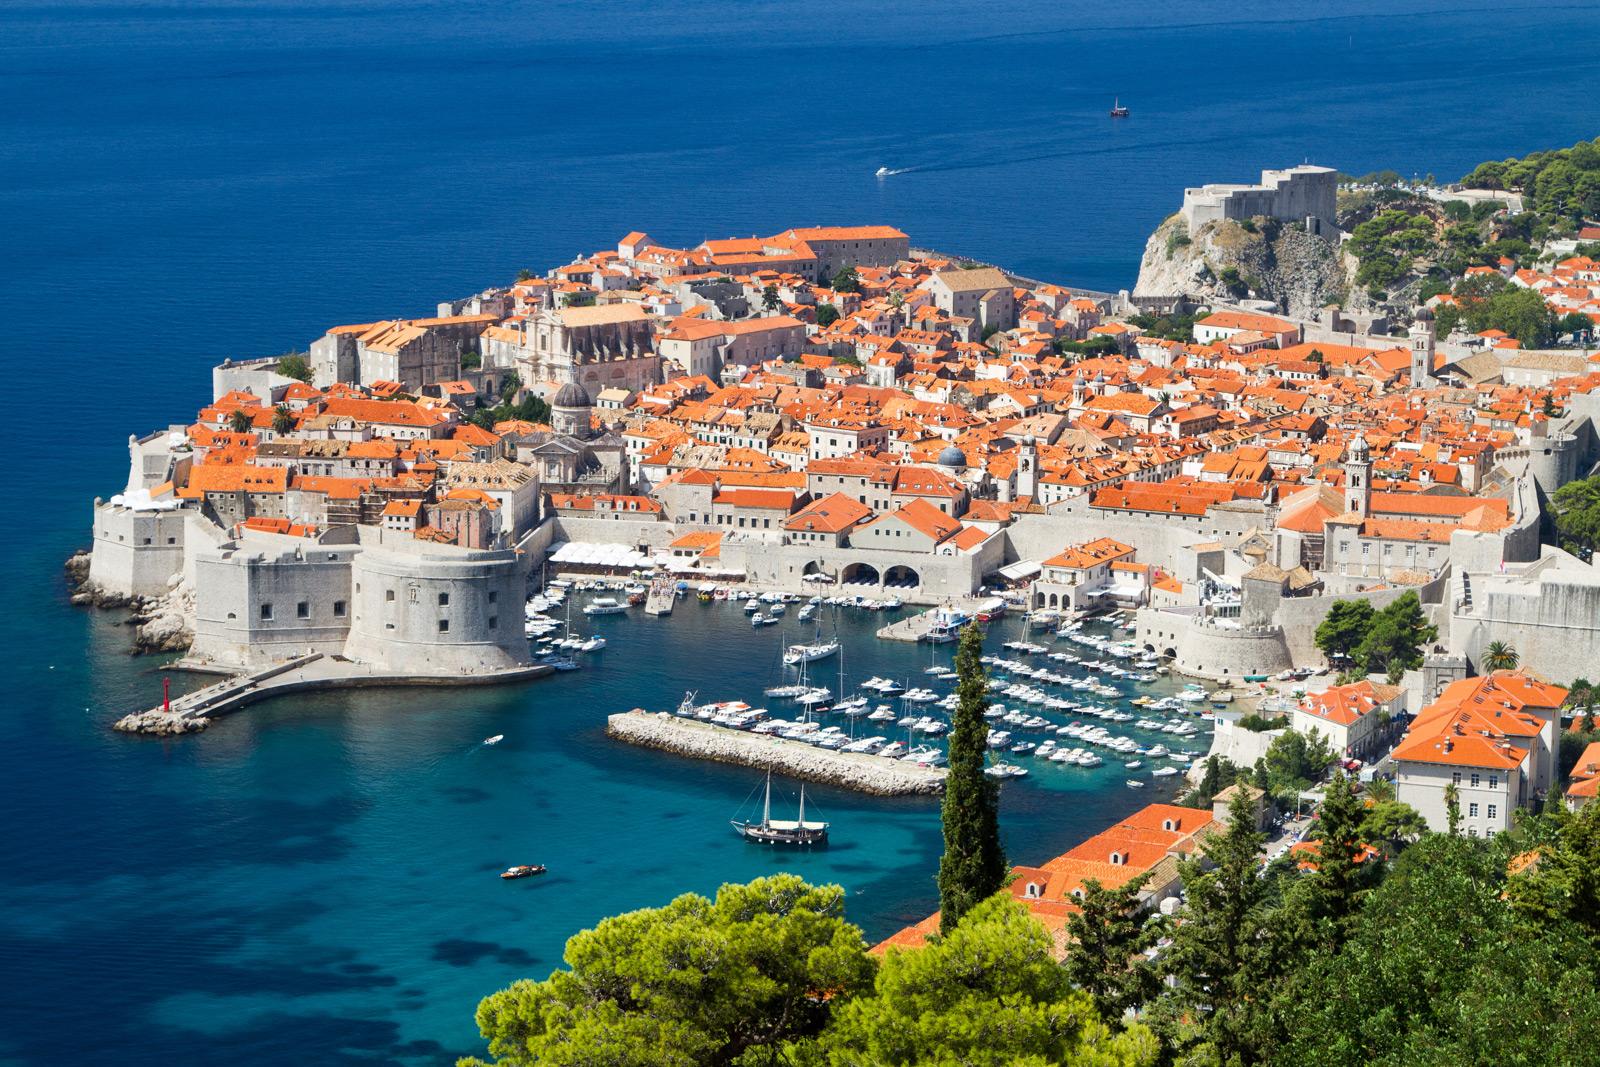 Adriatic Sea Charter Croatia Dubrovnik View